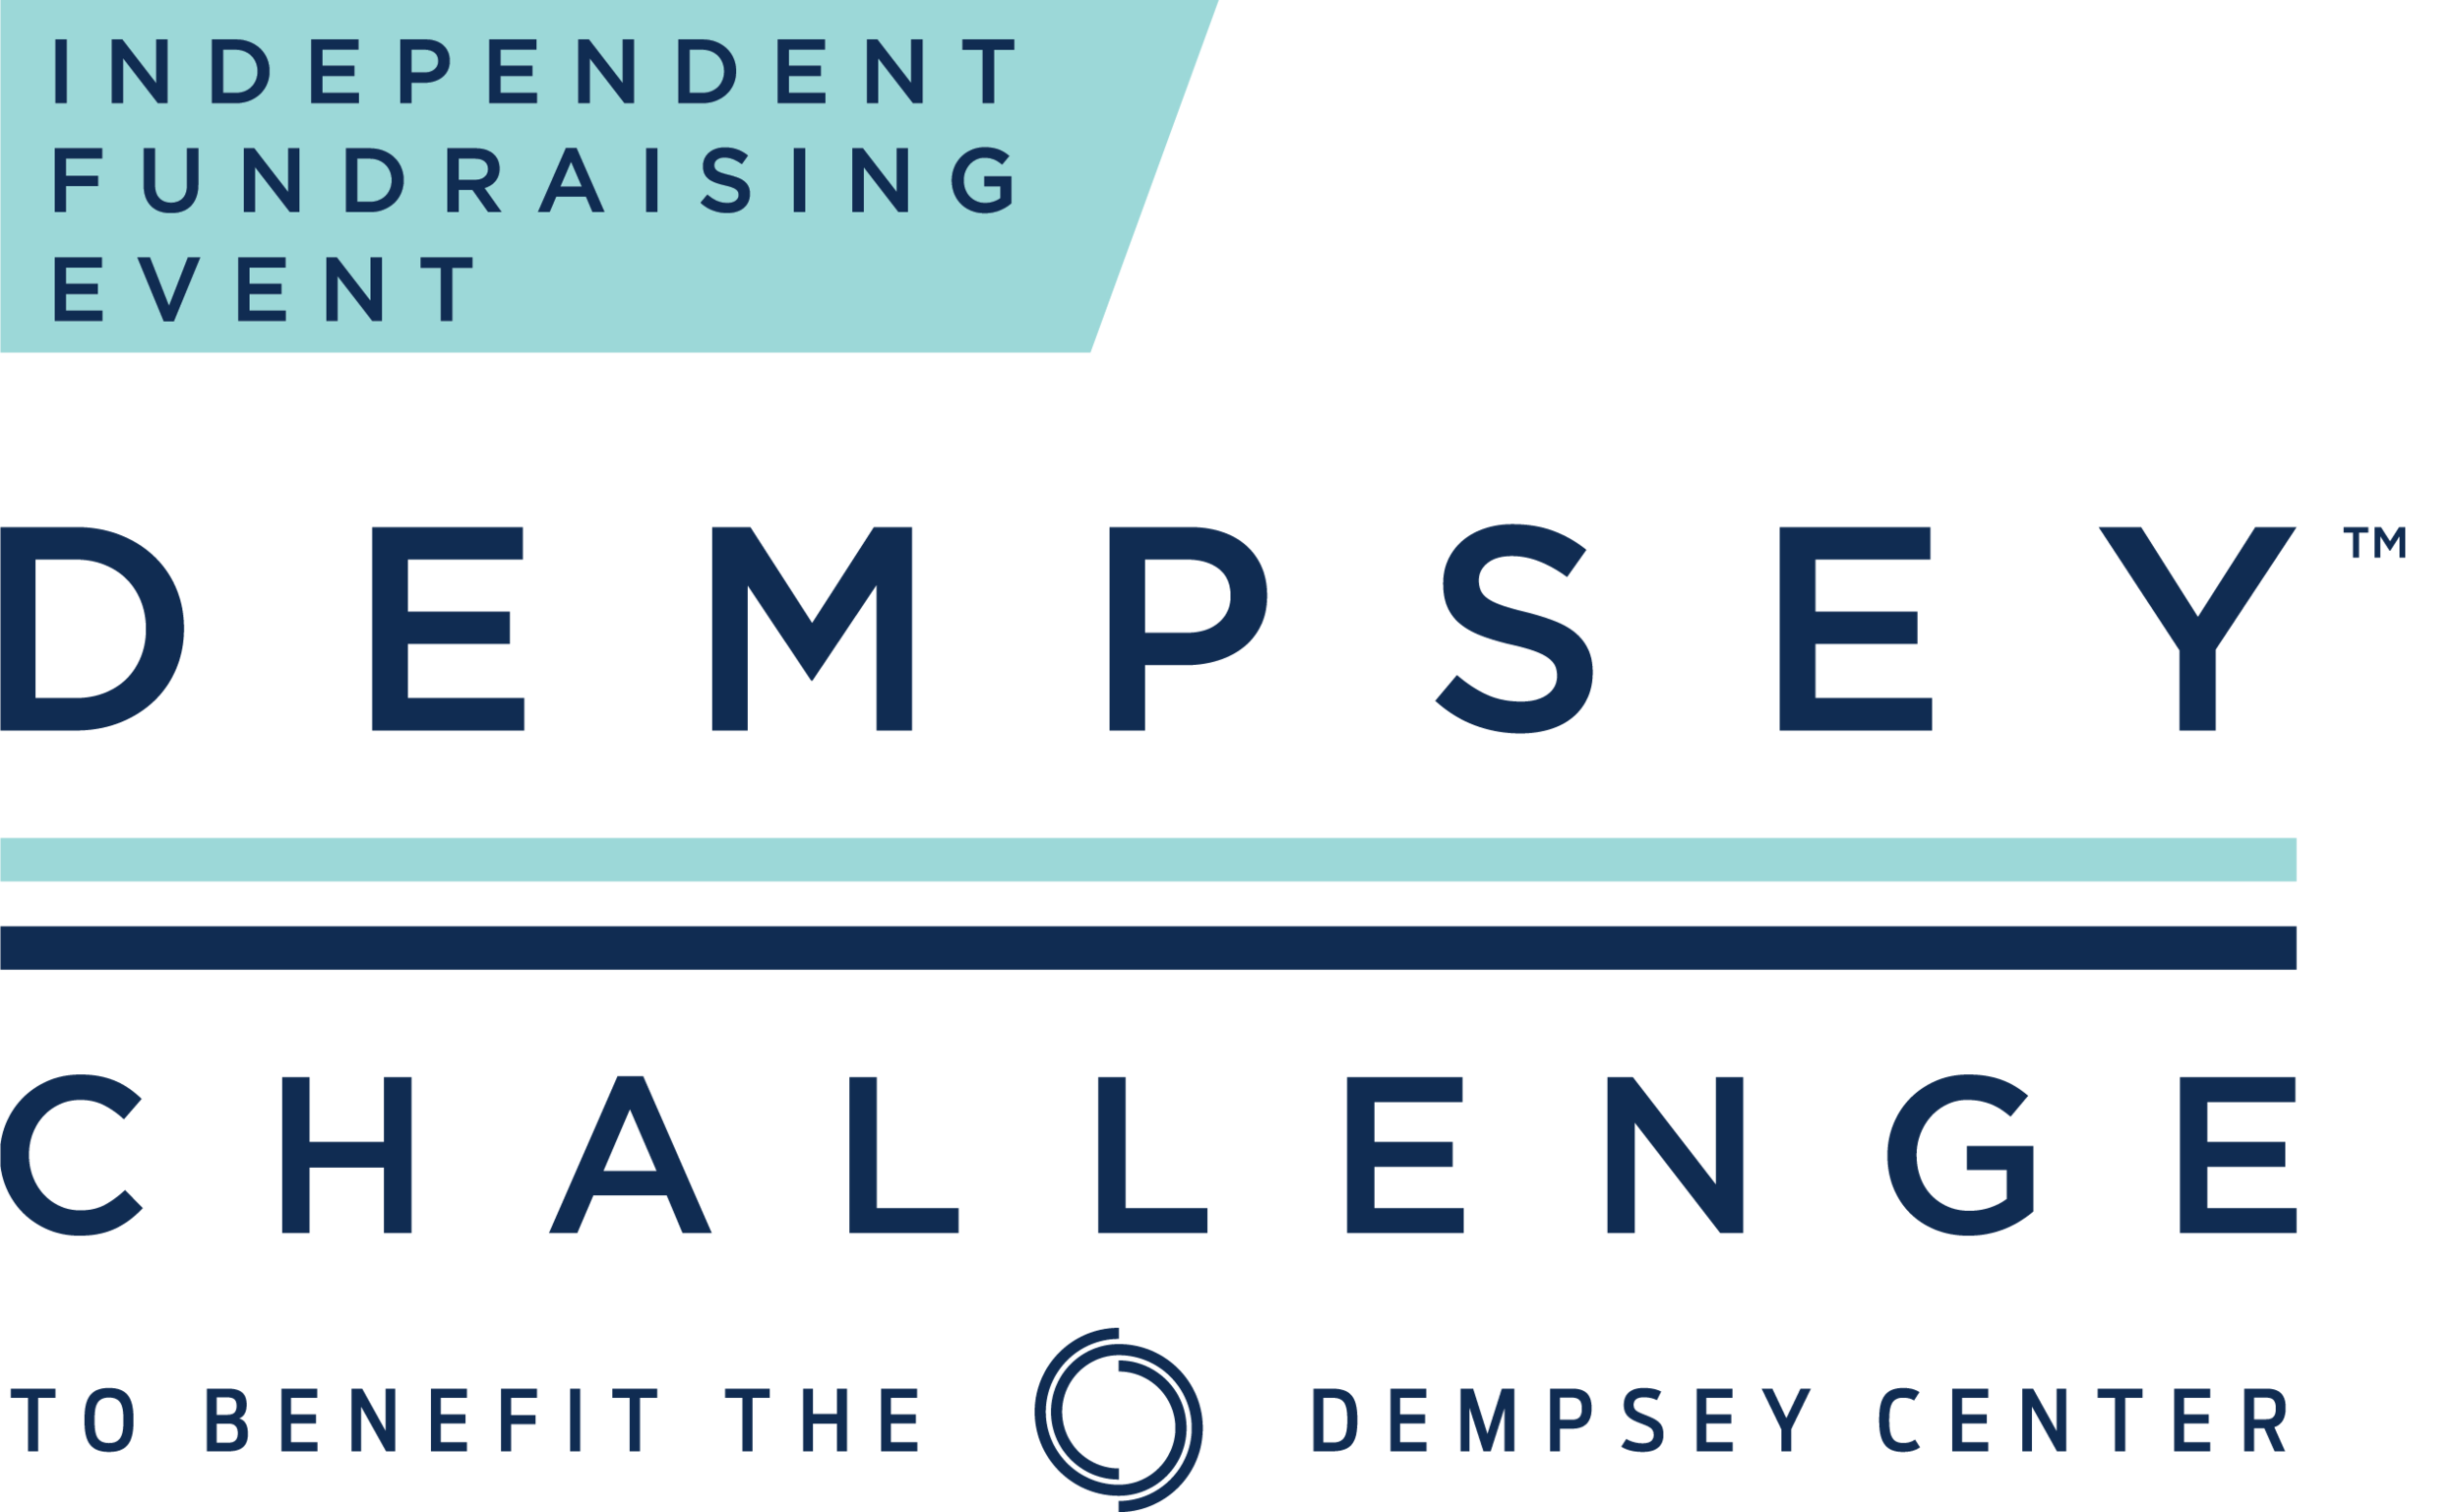 DempseyChallenge_IFE_Color.png